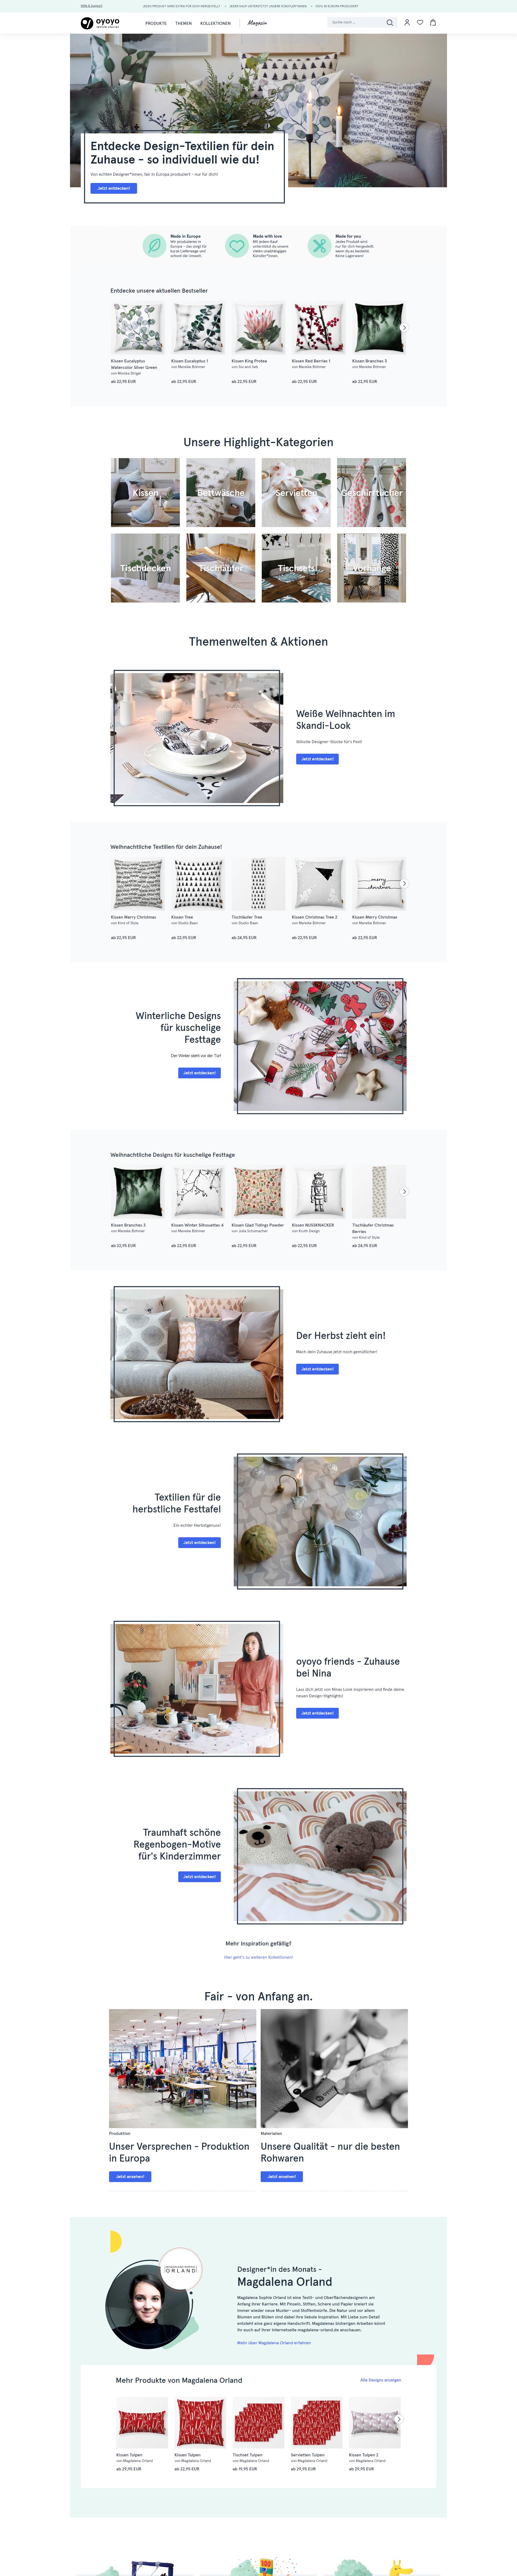 E Commerce Shopware Onlineshop Webdesign Templates Design Themes Tools Webshop Layout Template Inspiration Website Theme Simple Cor Webdesign Web Design Layout